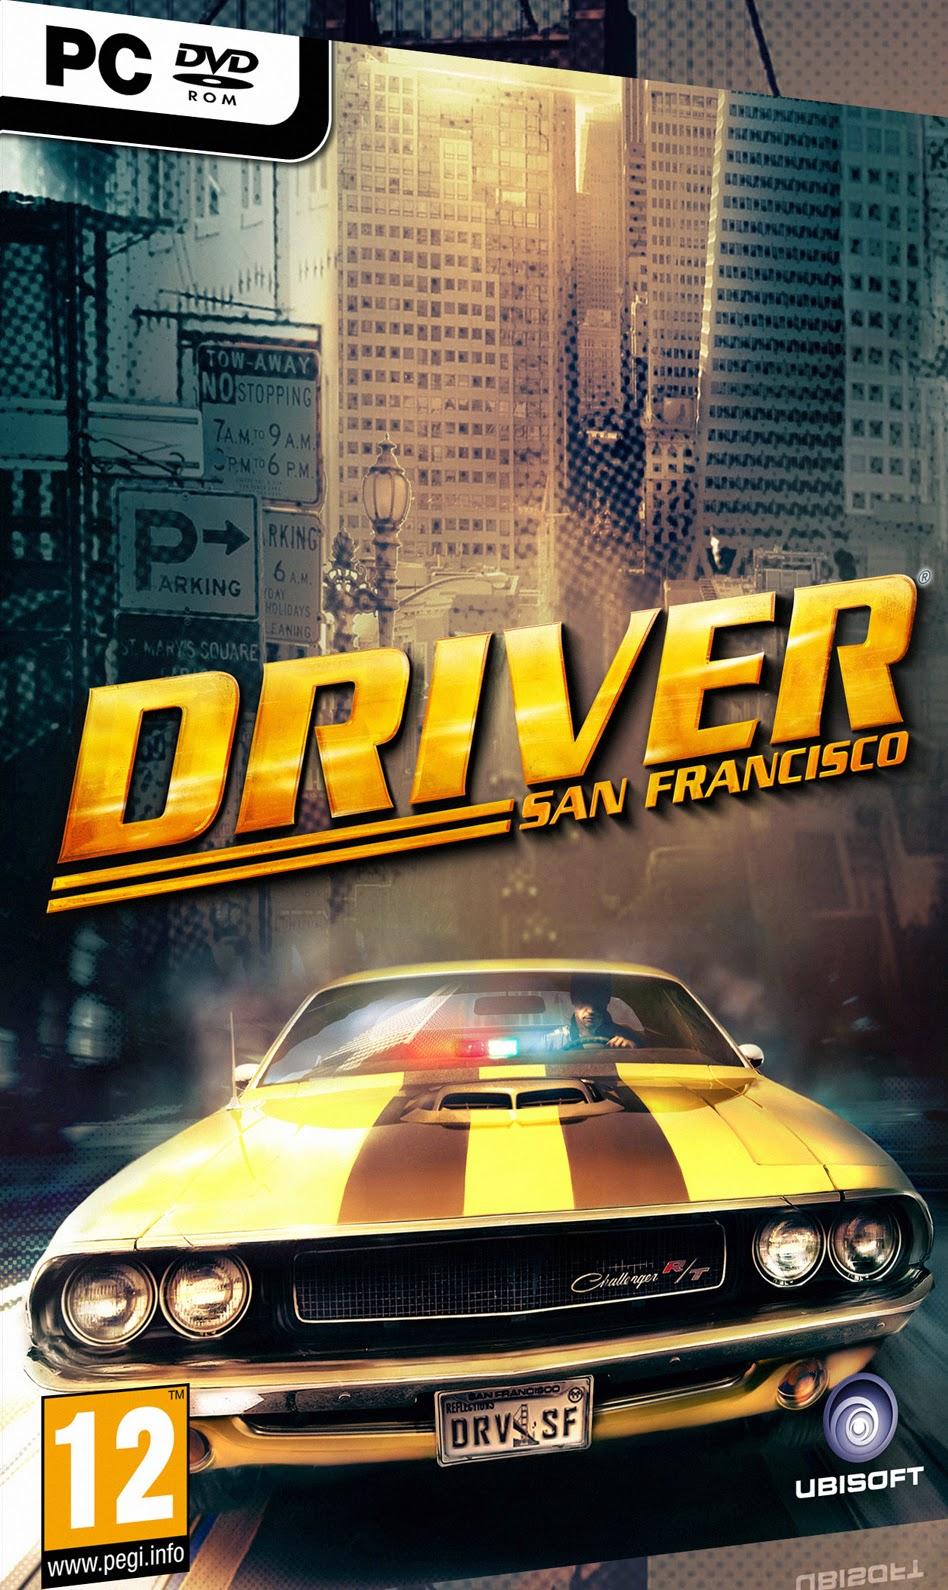 Free Download Driver San Francisco Full PC Game